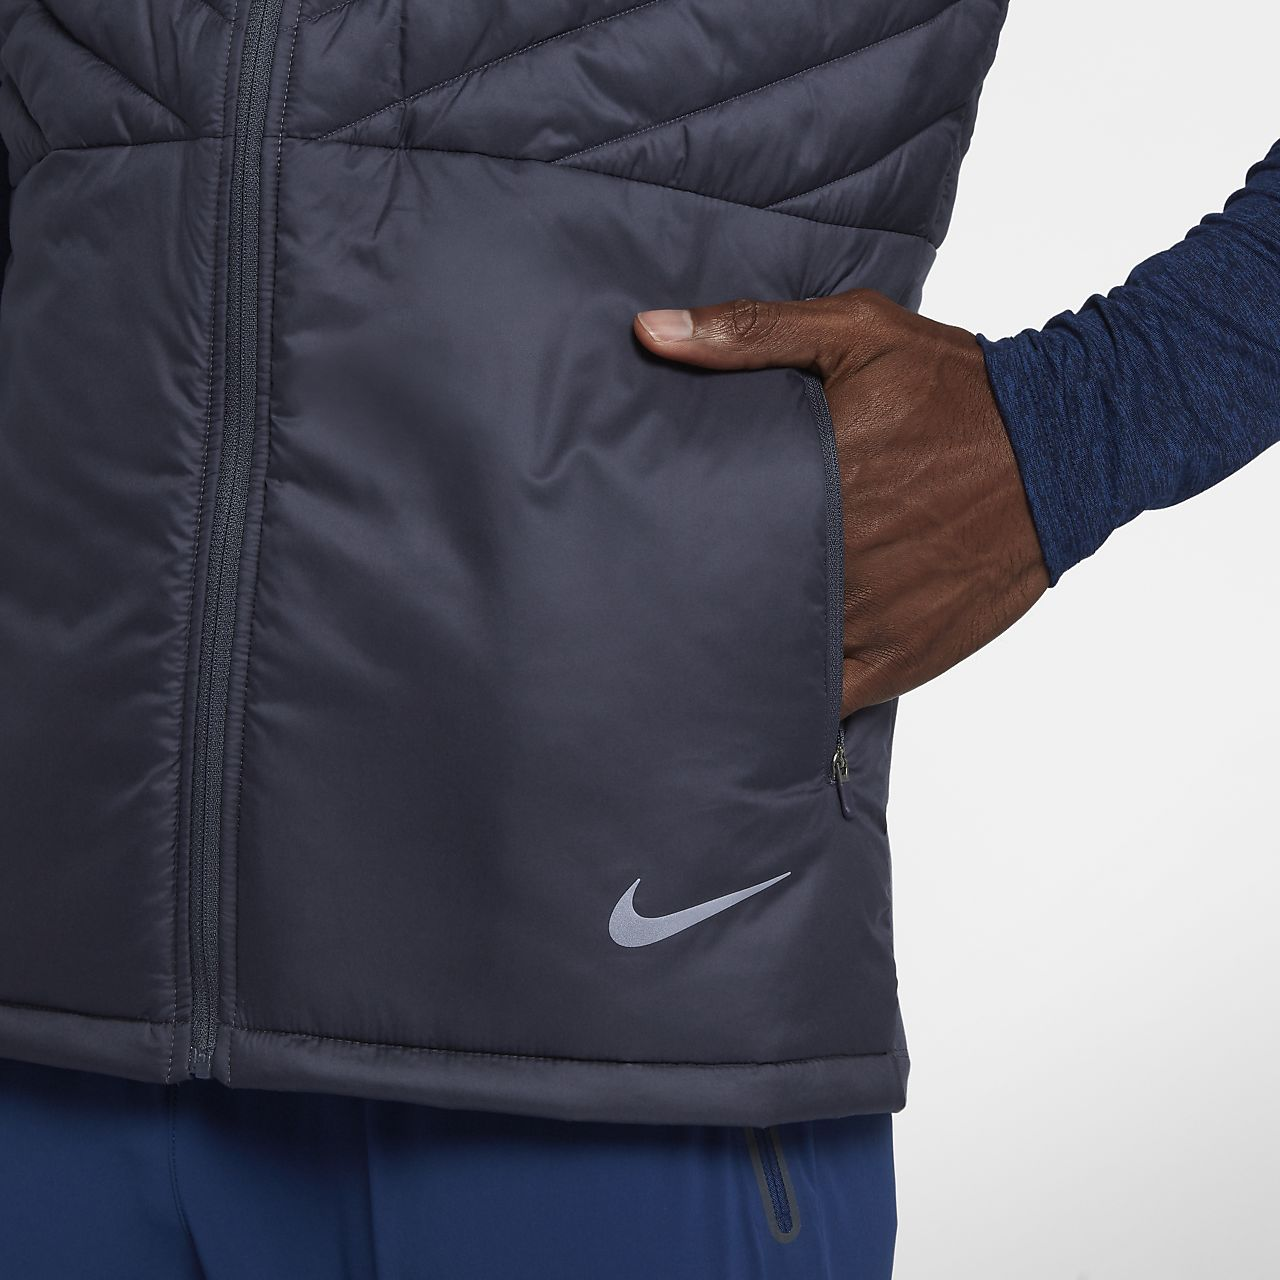 3c1e612b7743 Nike AeroLayer Men s Running Vest. Nike.com